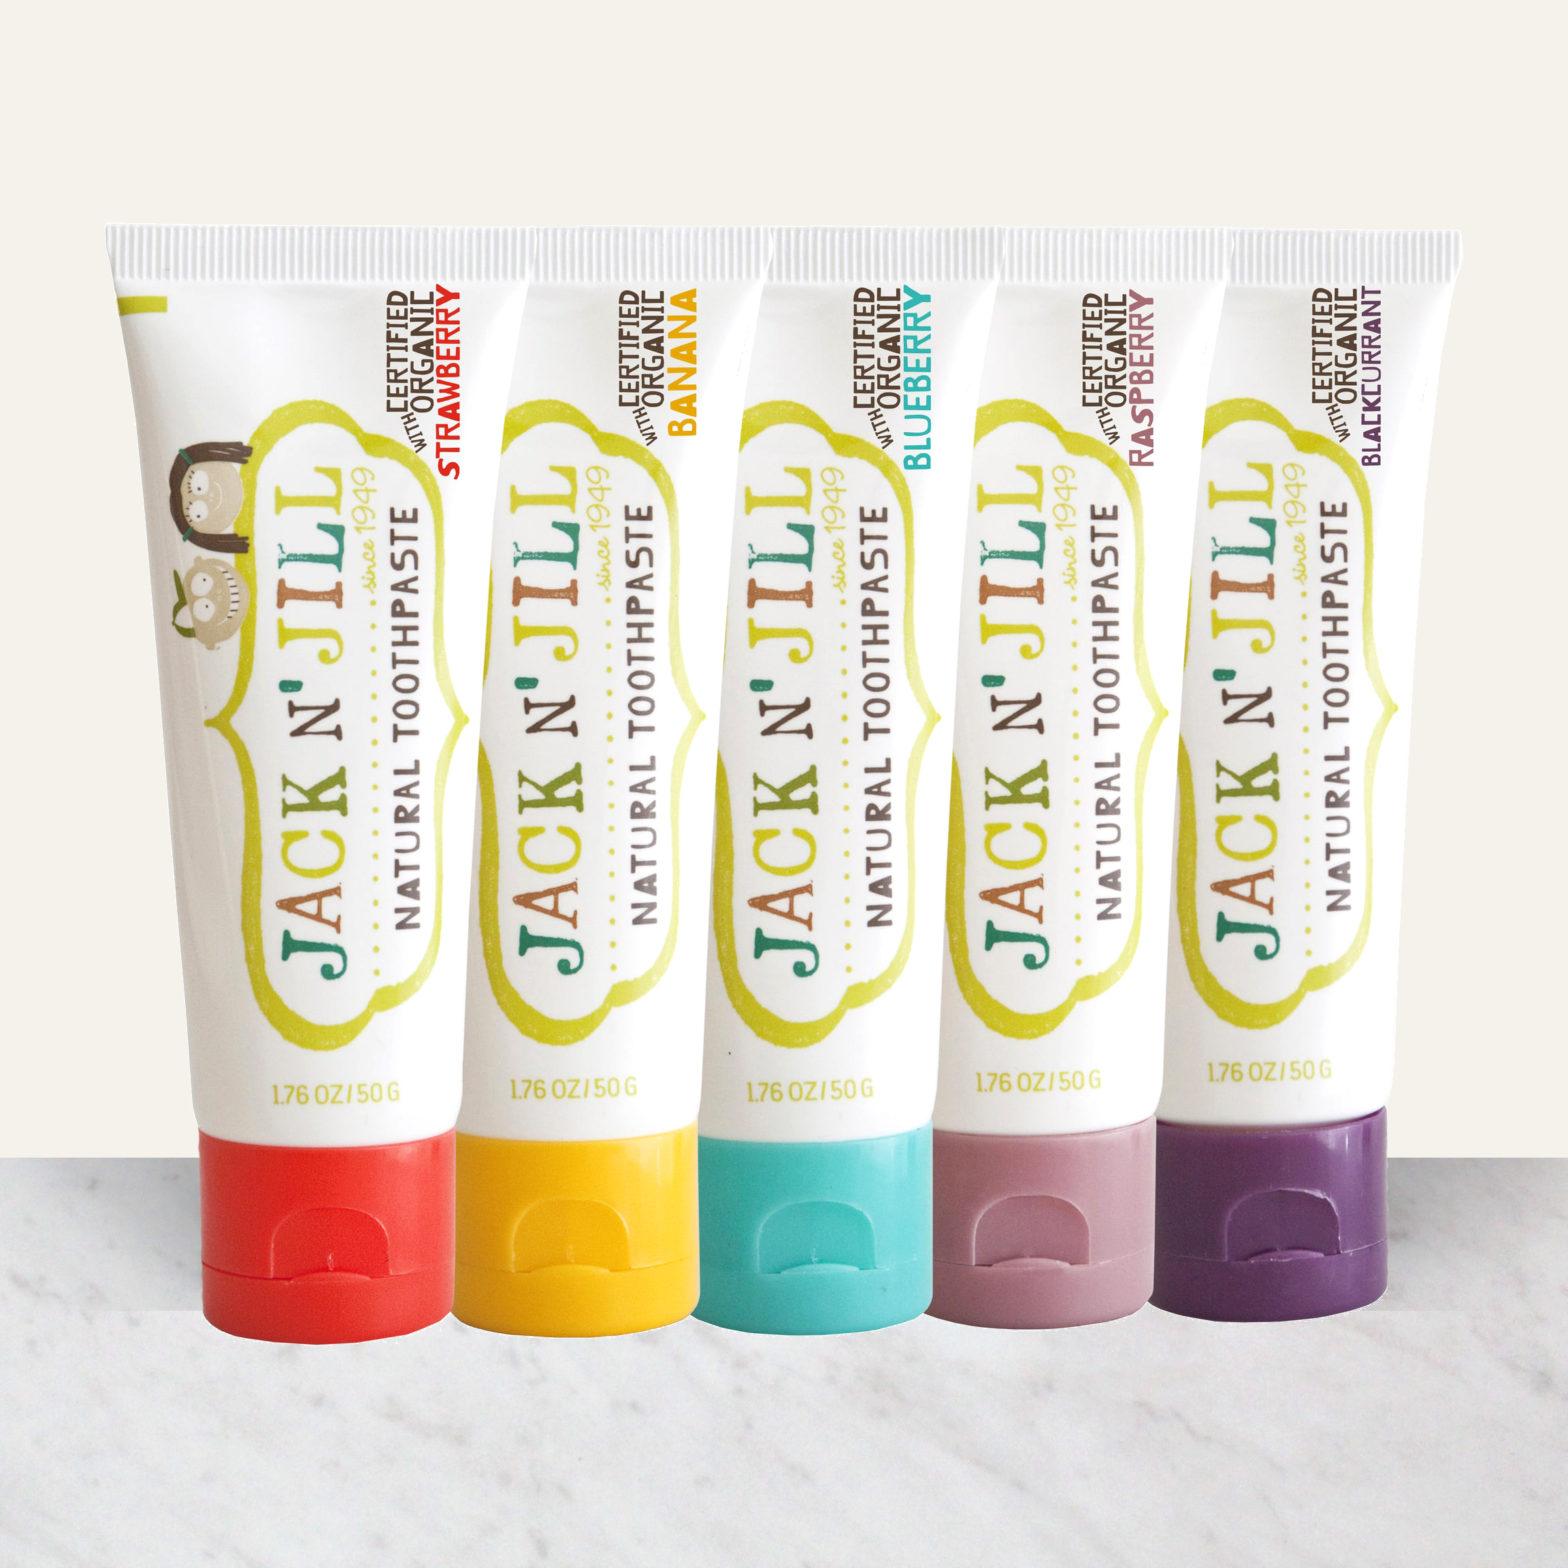 Jack N' Jill Natural Toothpaste Giveaway